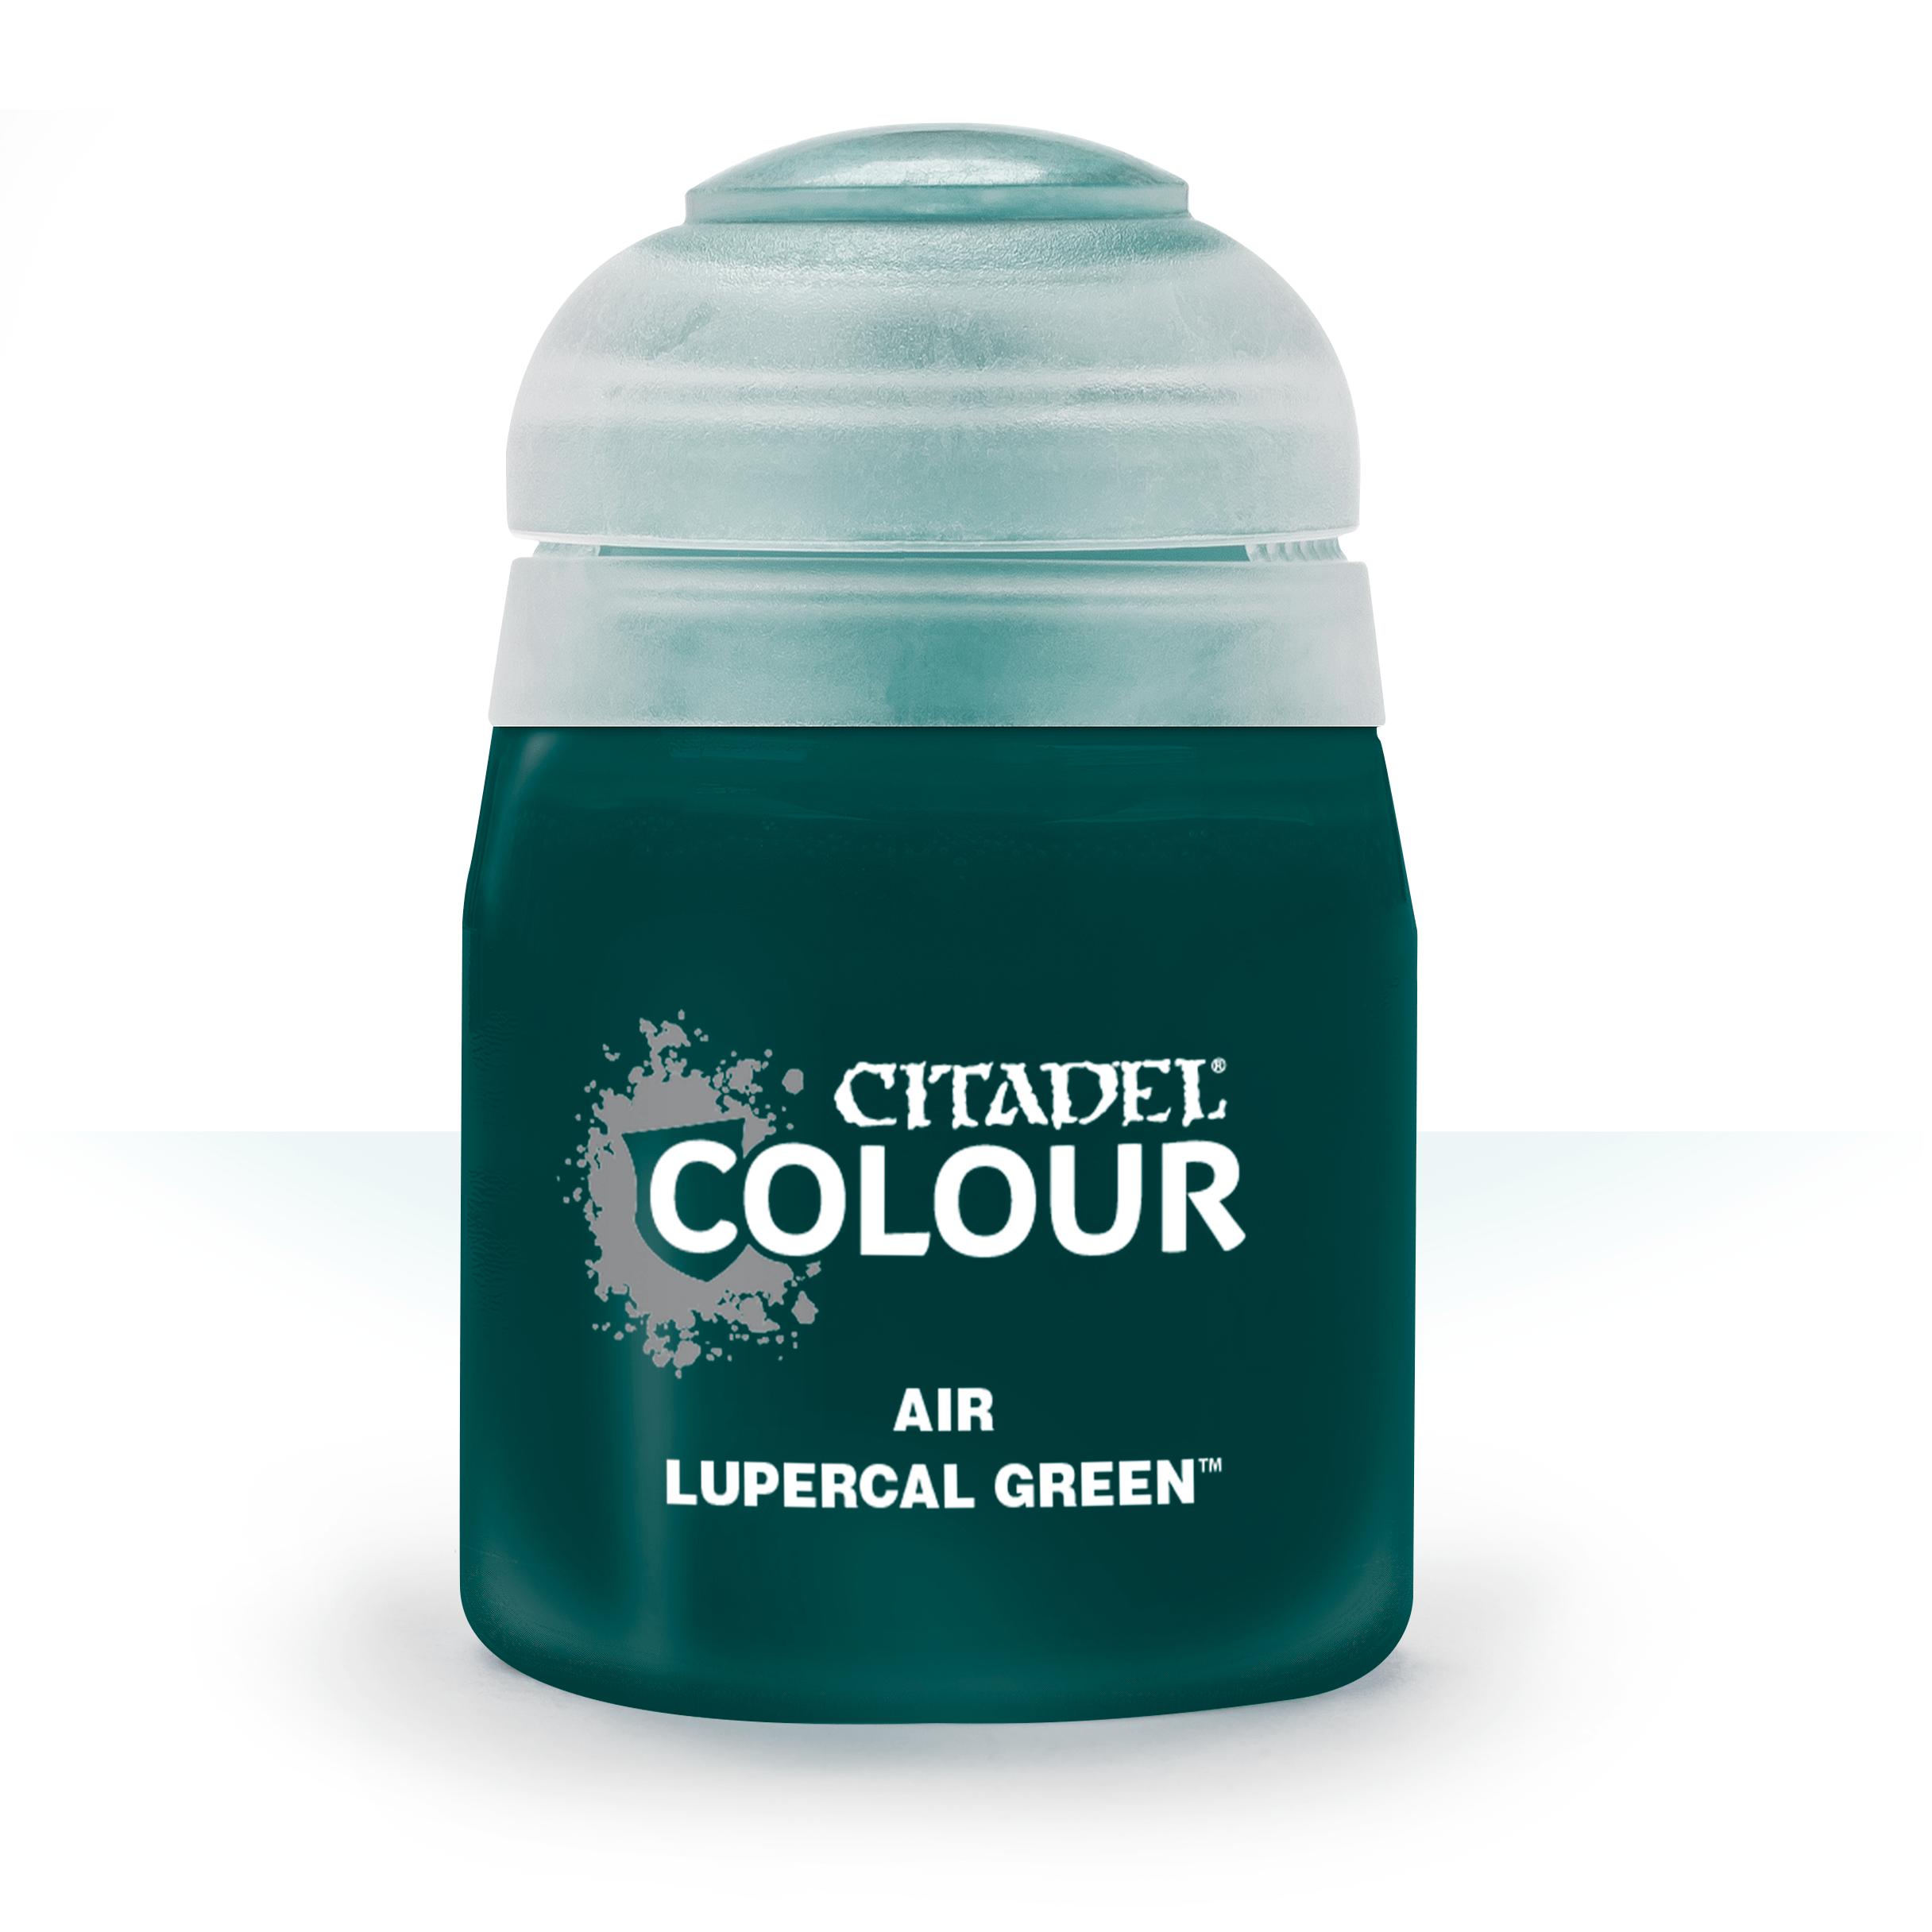 Lupercal Green, Citadel Air 24ml